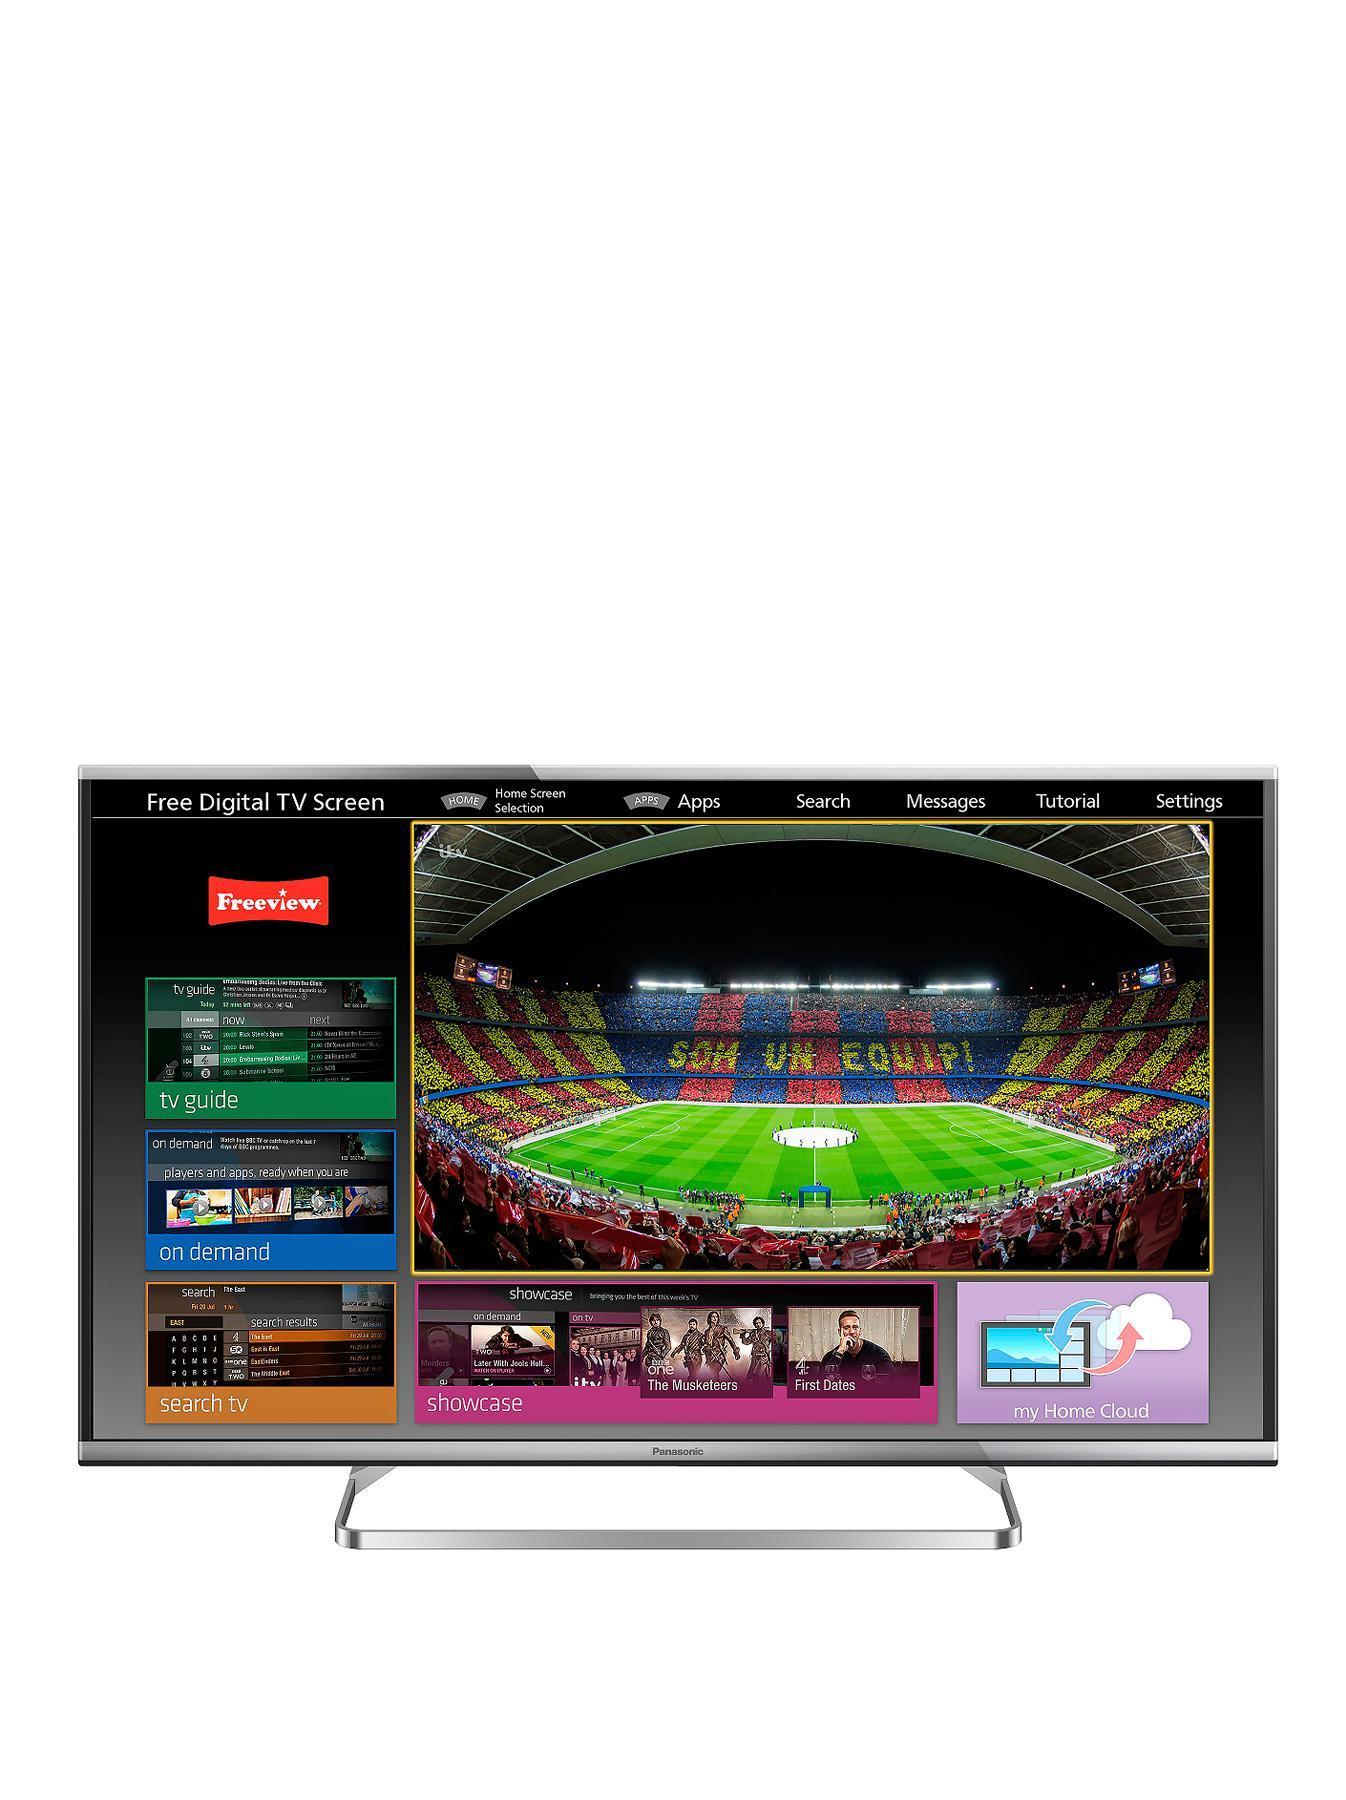 TX42AS650B 42 inch Passive 3D Smart Full HD Freeview HD LED TV